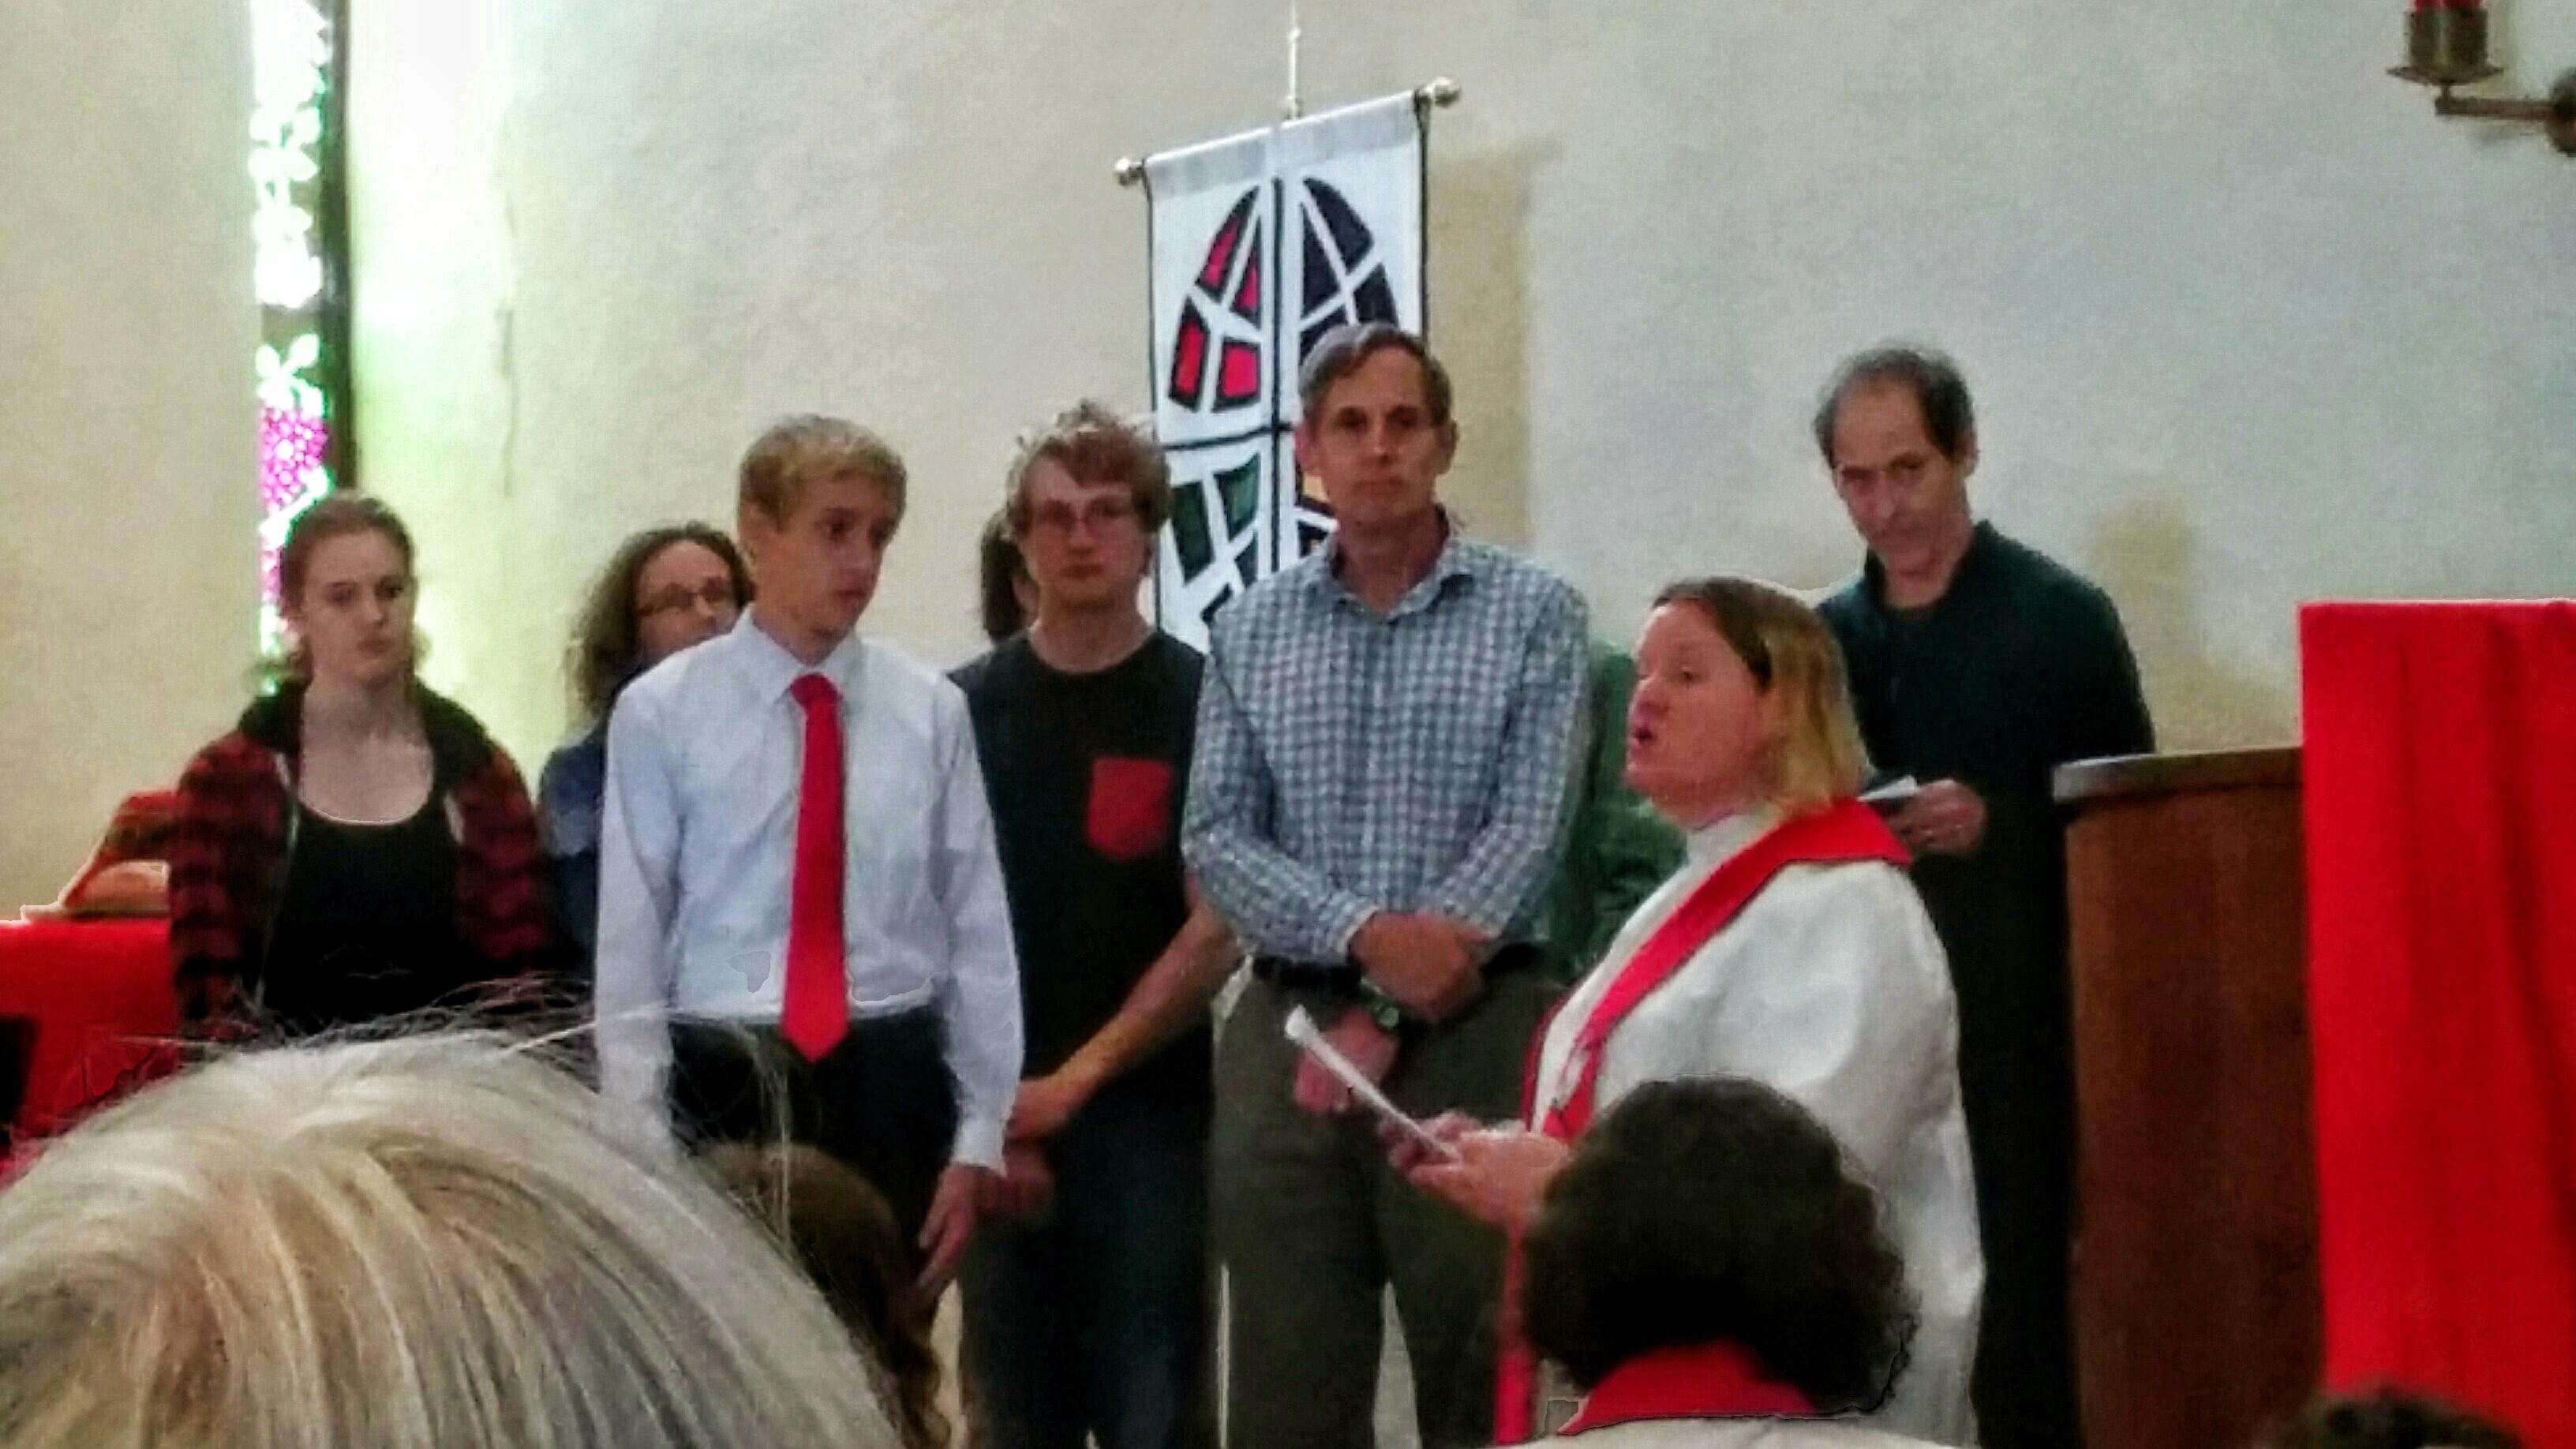 2015-05-24 Pentecost-Henry-Anderson-Confirmation 30.1.jpg